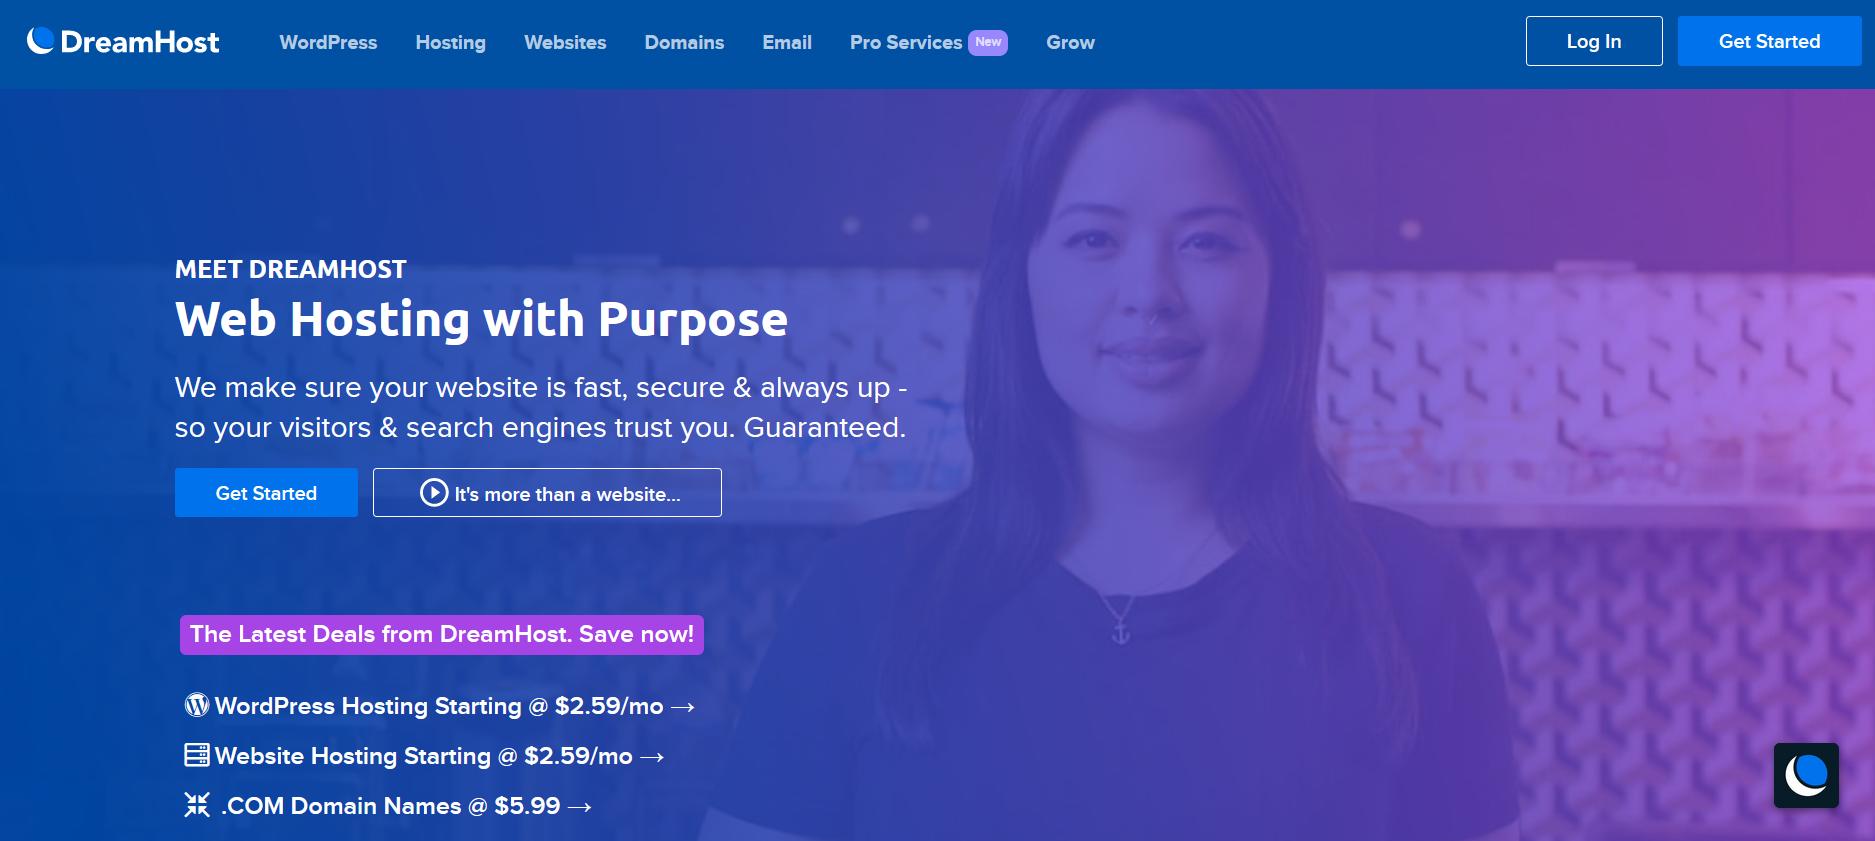 WordPress Hosting Services - dreamhost